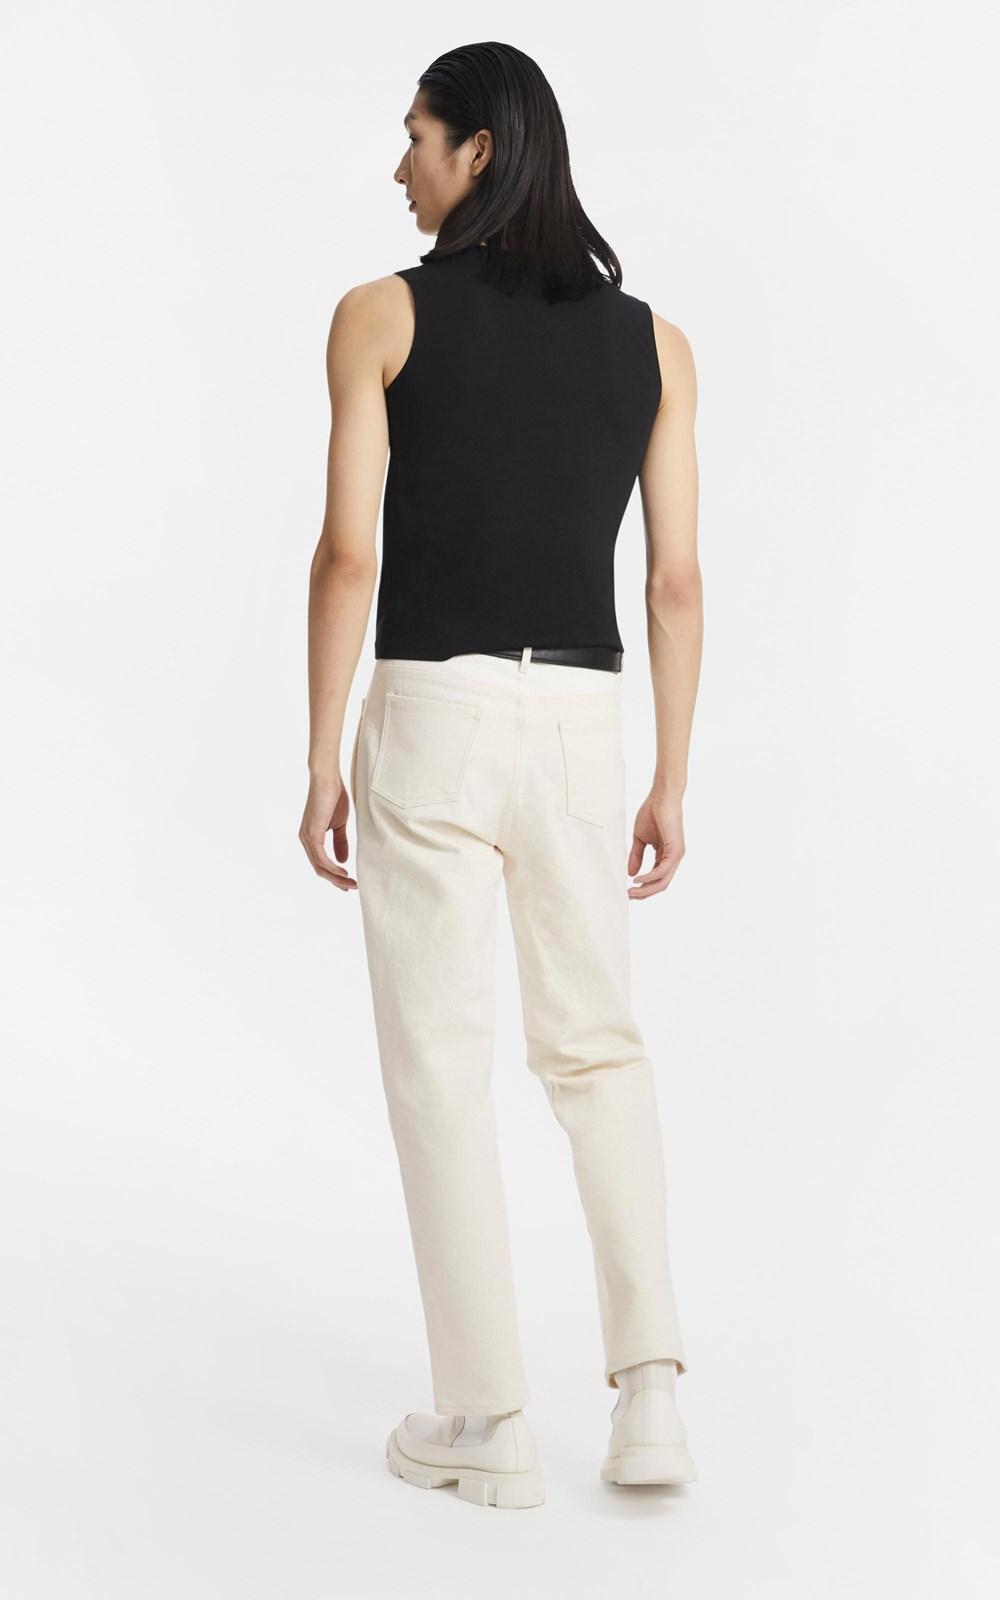 Pants | SIGNATURE UNISEX JEAN